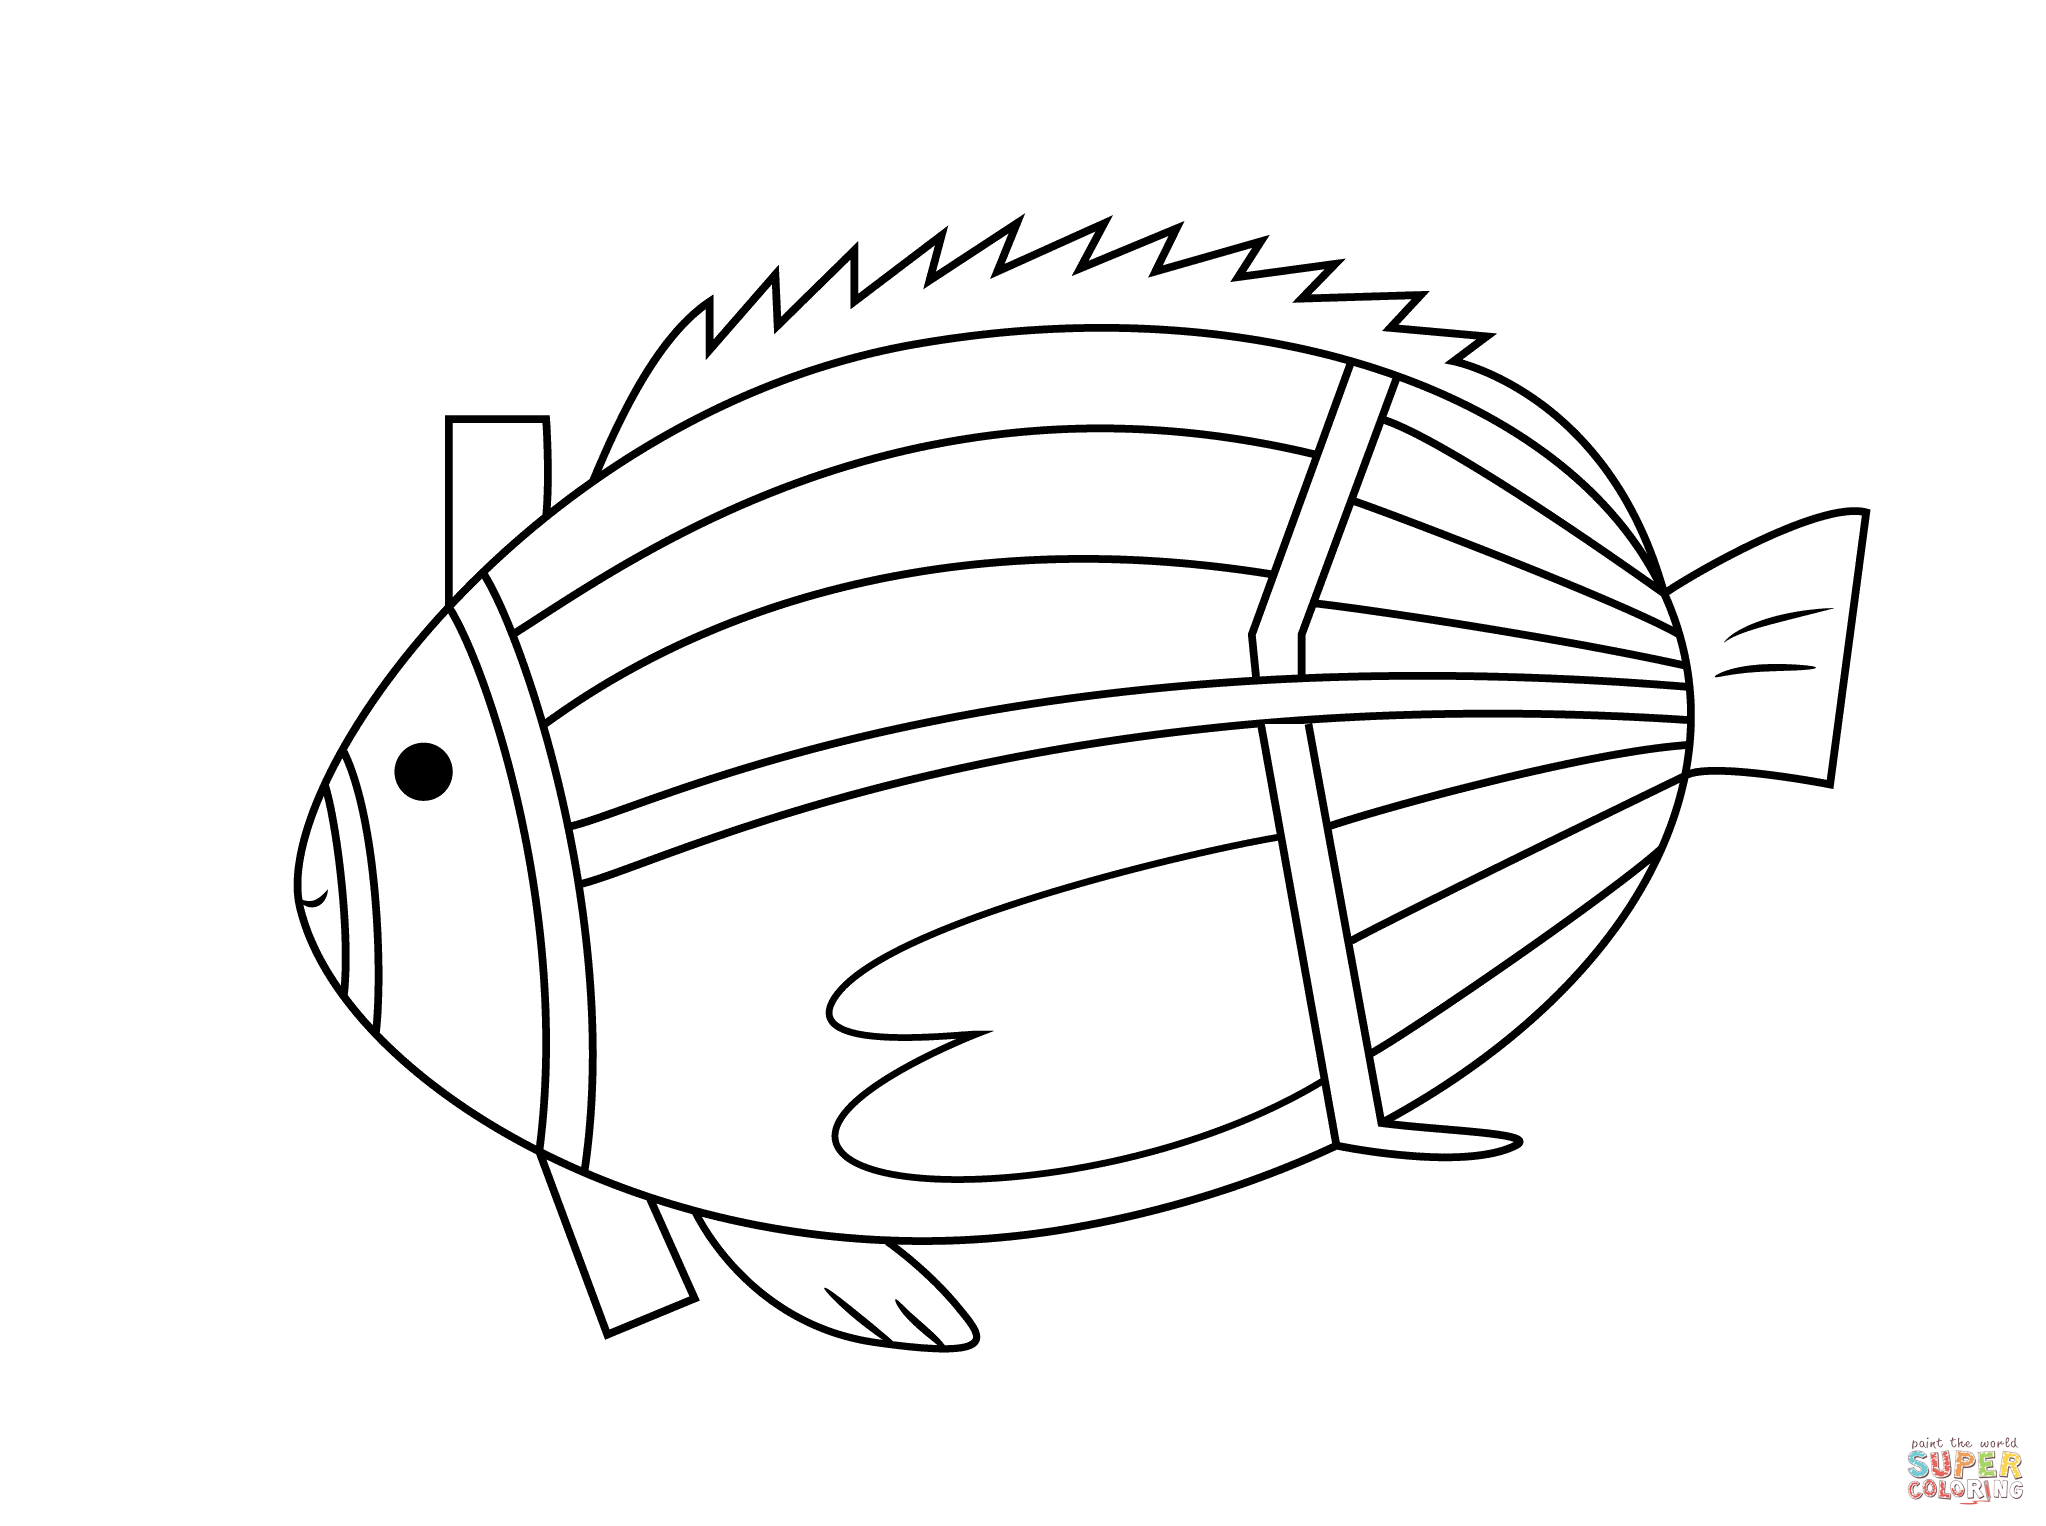 Aboriginal Painting Of Fish Coloring Page Free Printable